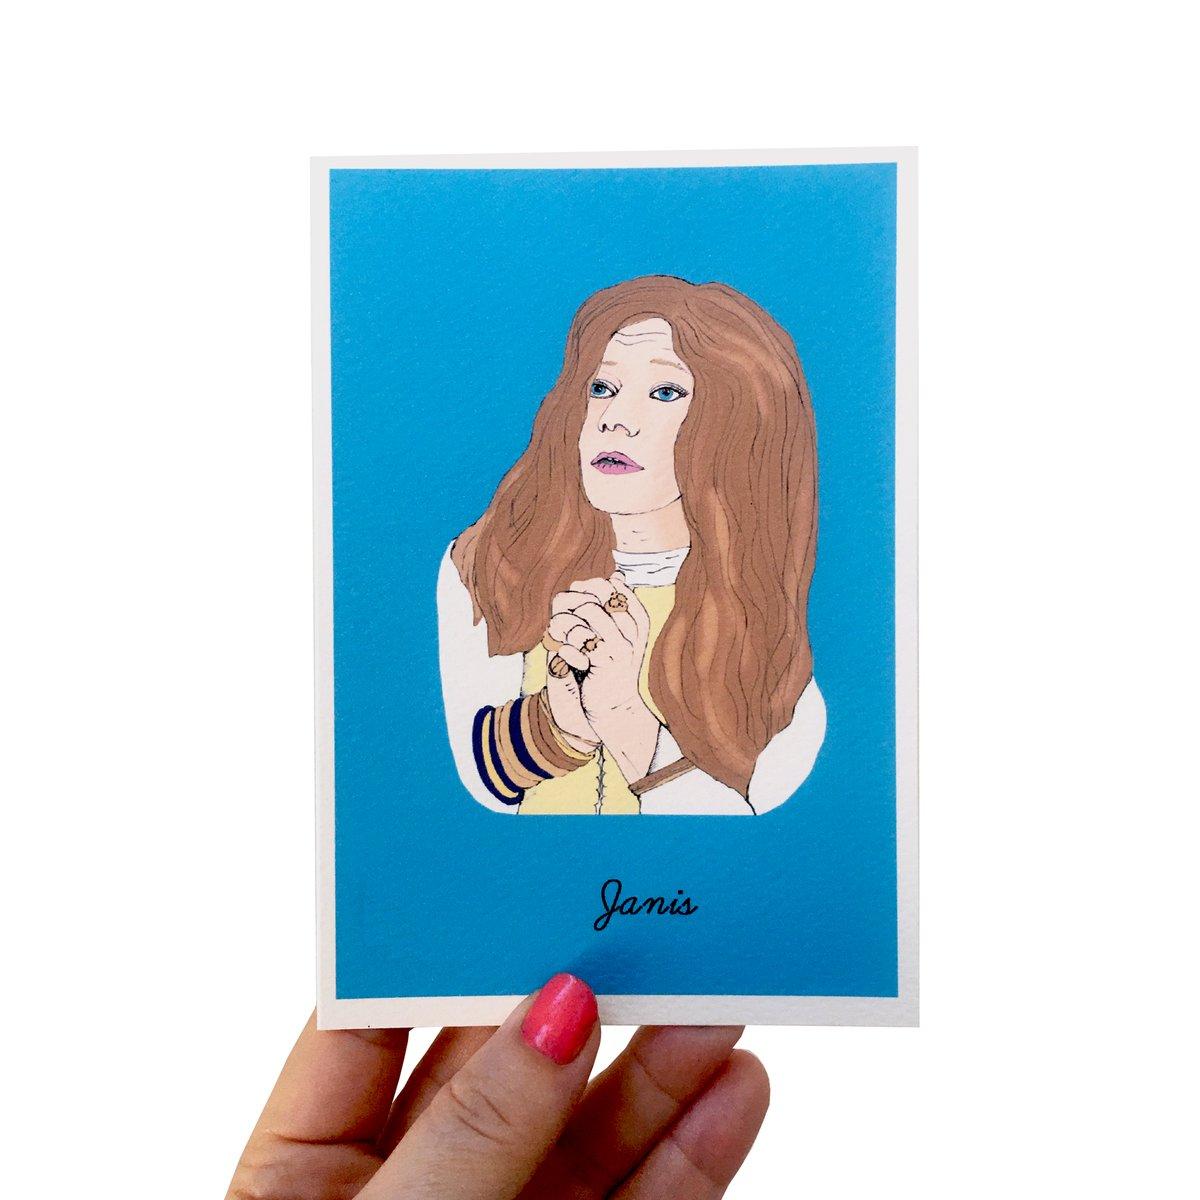 Janis Joplin Iconic Figures Card